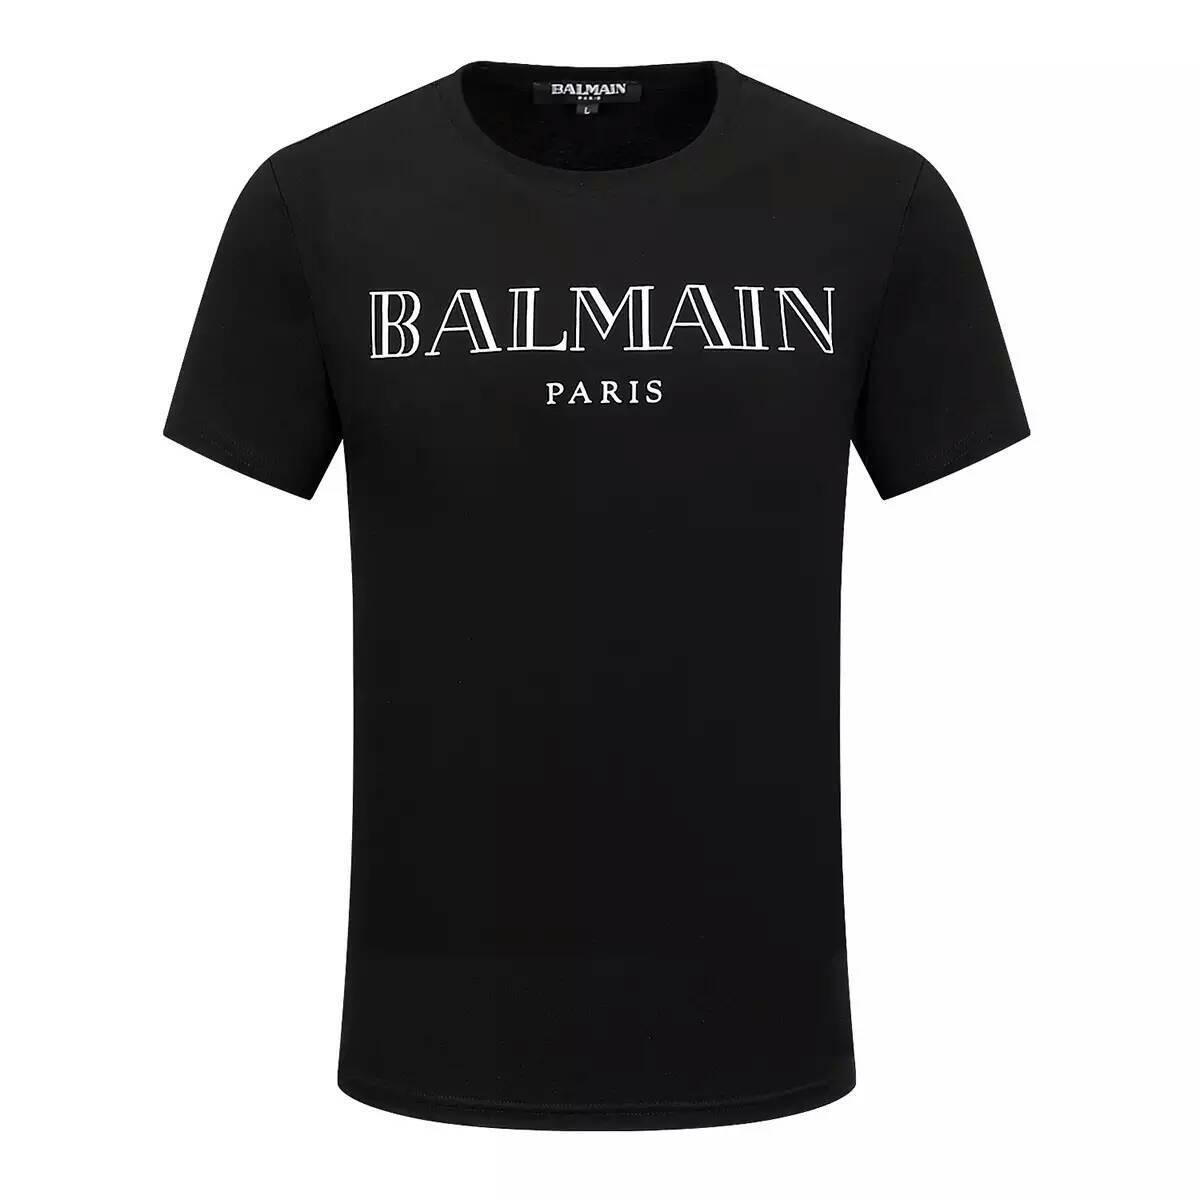 06ea1c909b Brand:Balmain.Color:Black,White as photoes. Style:Basic Tee. Sleeveless.  Size Type:Regular. Material:95%Cotton.Gender: For Men. Size:S,M,L,XL,XXL.